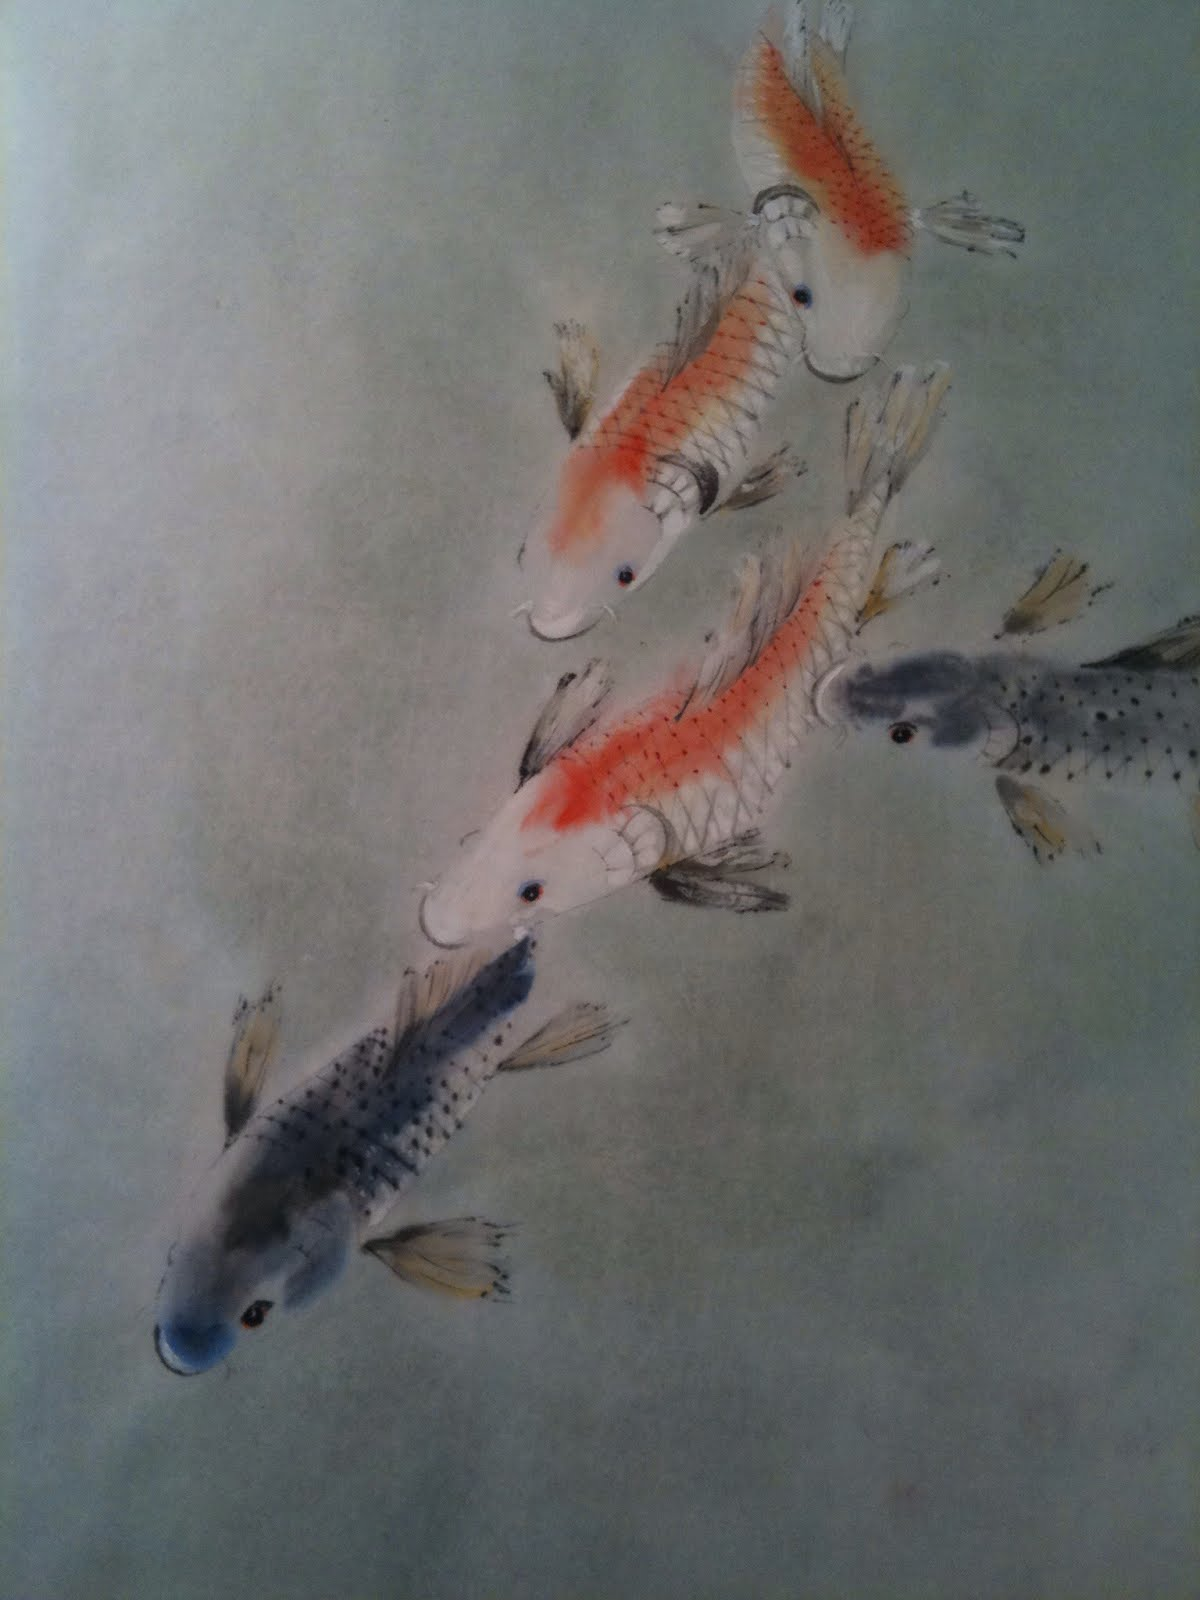 Chinese brush art american style 10 000 brush strokes for Perfect koi